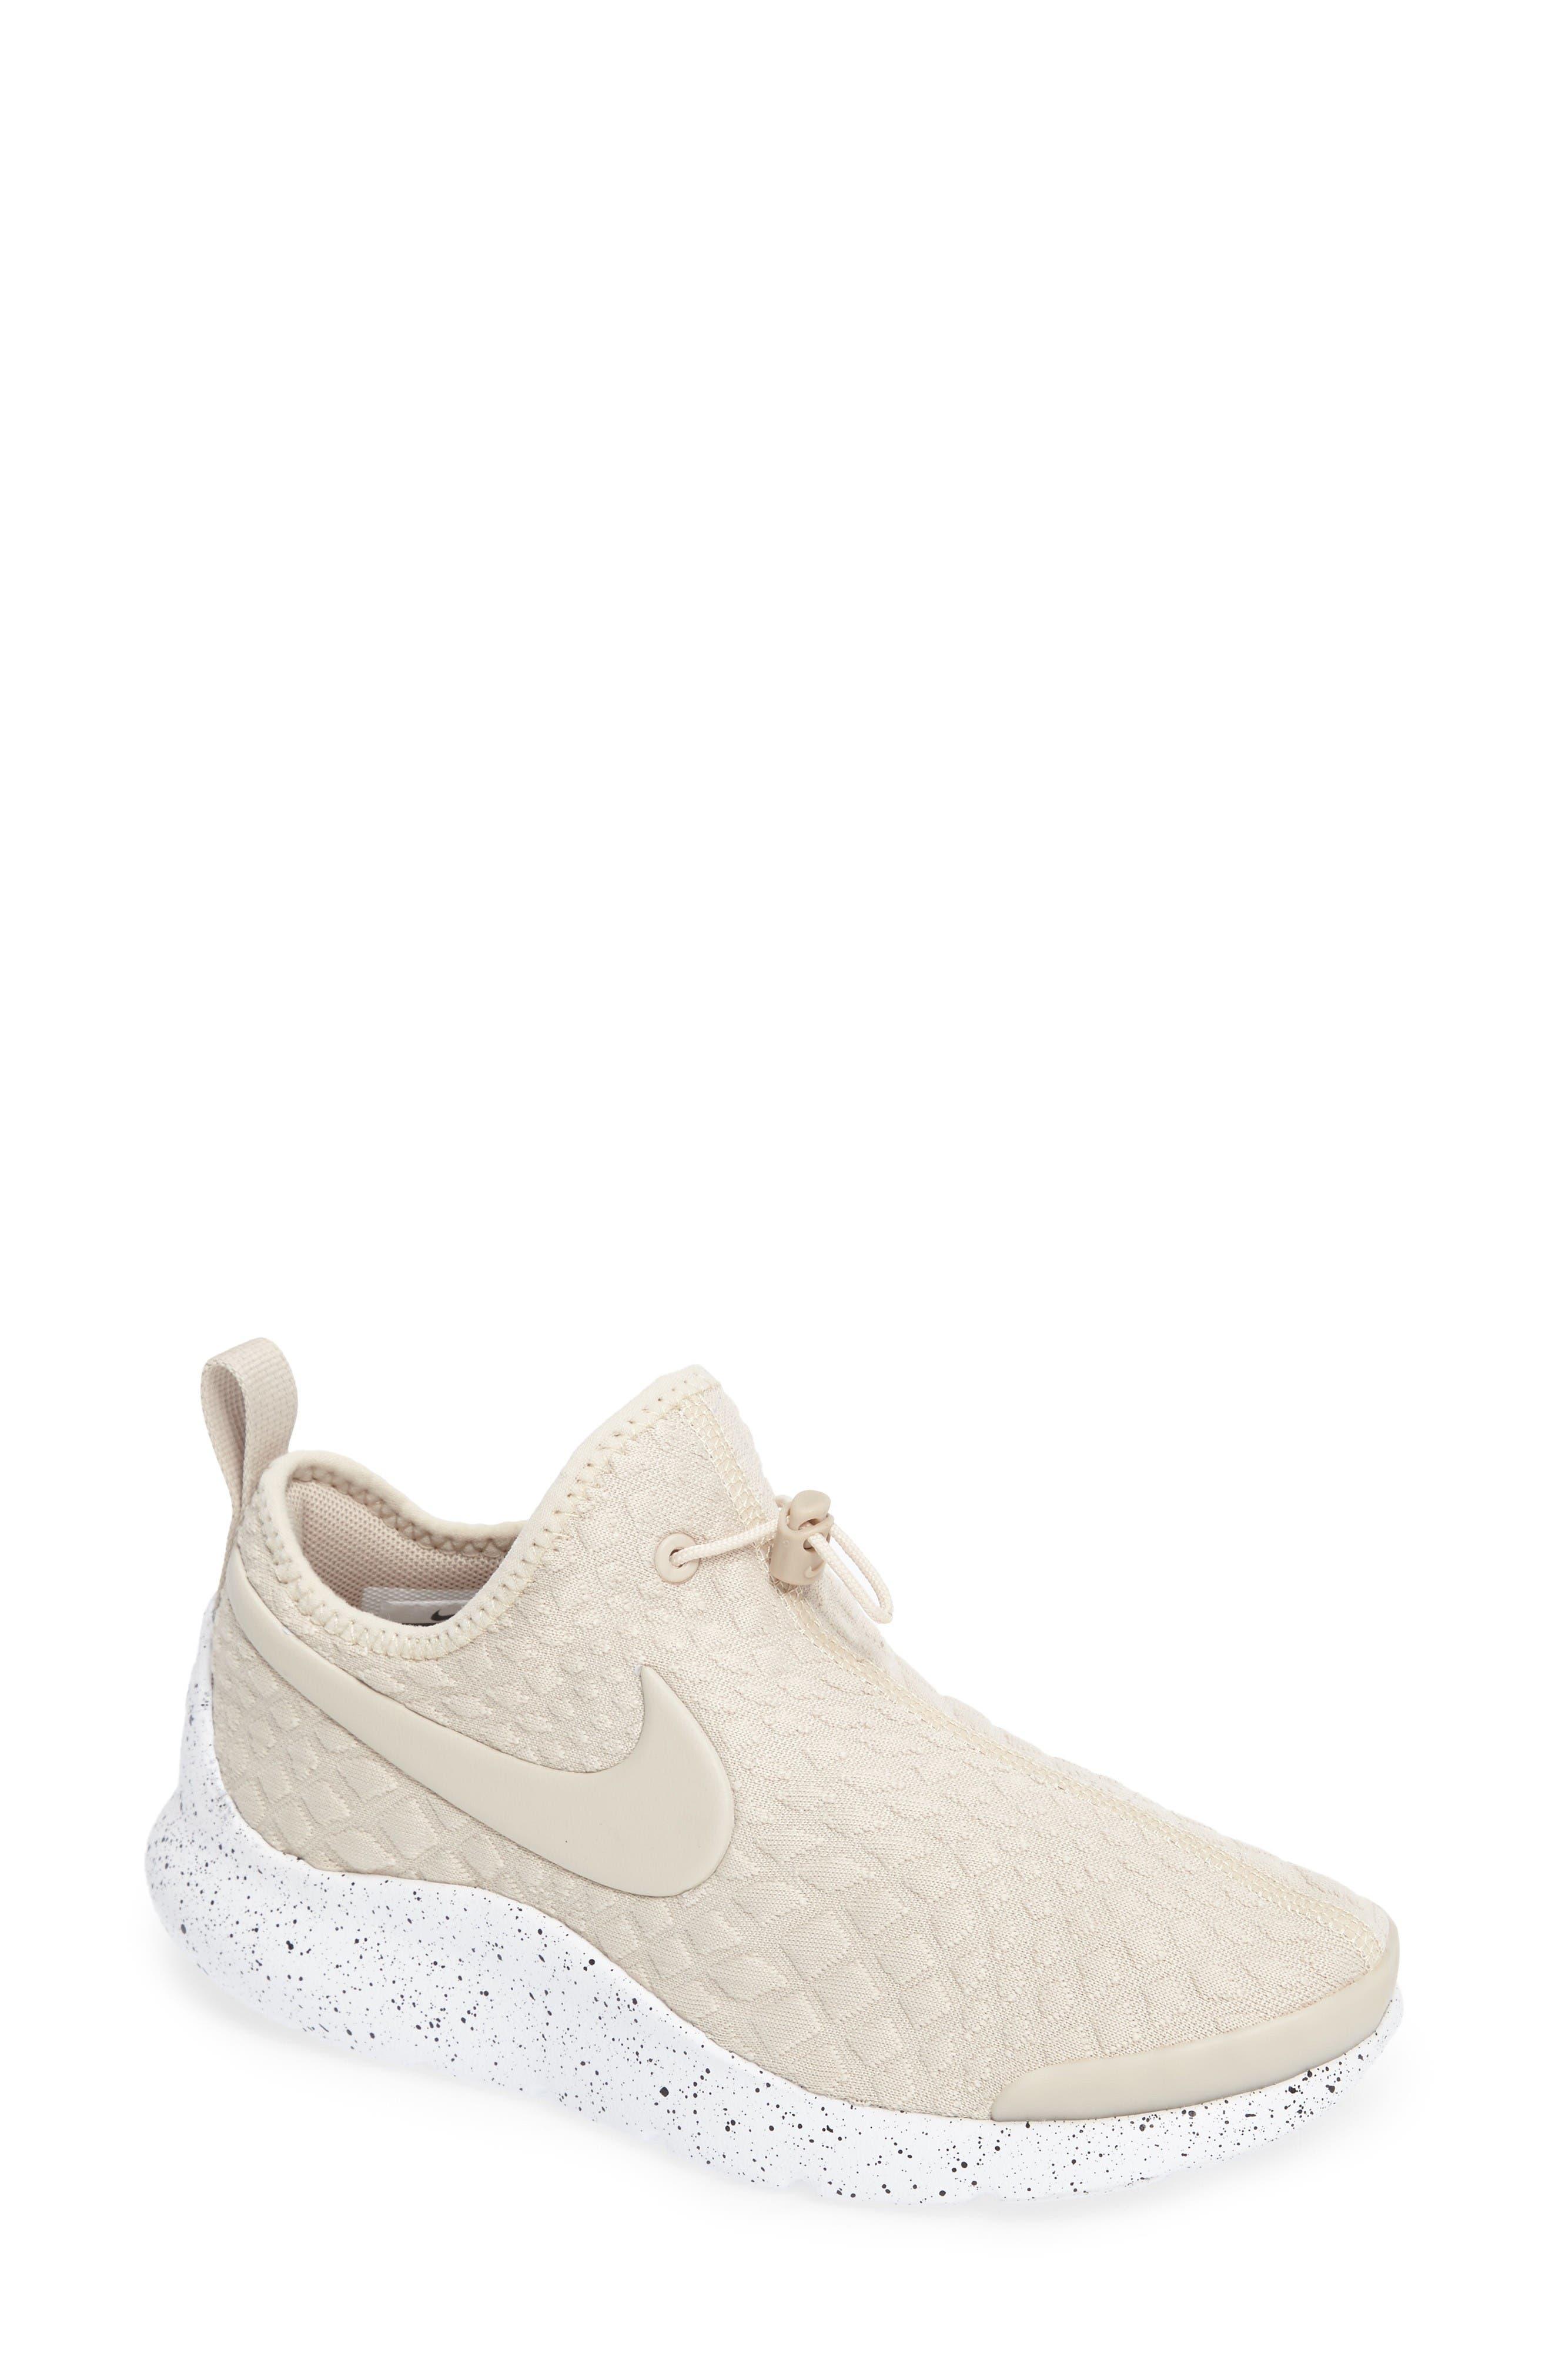 Main Image - Nike Aptare Sneaker (Women)